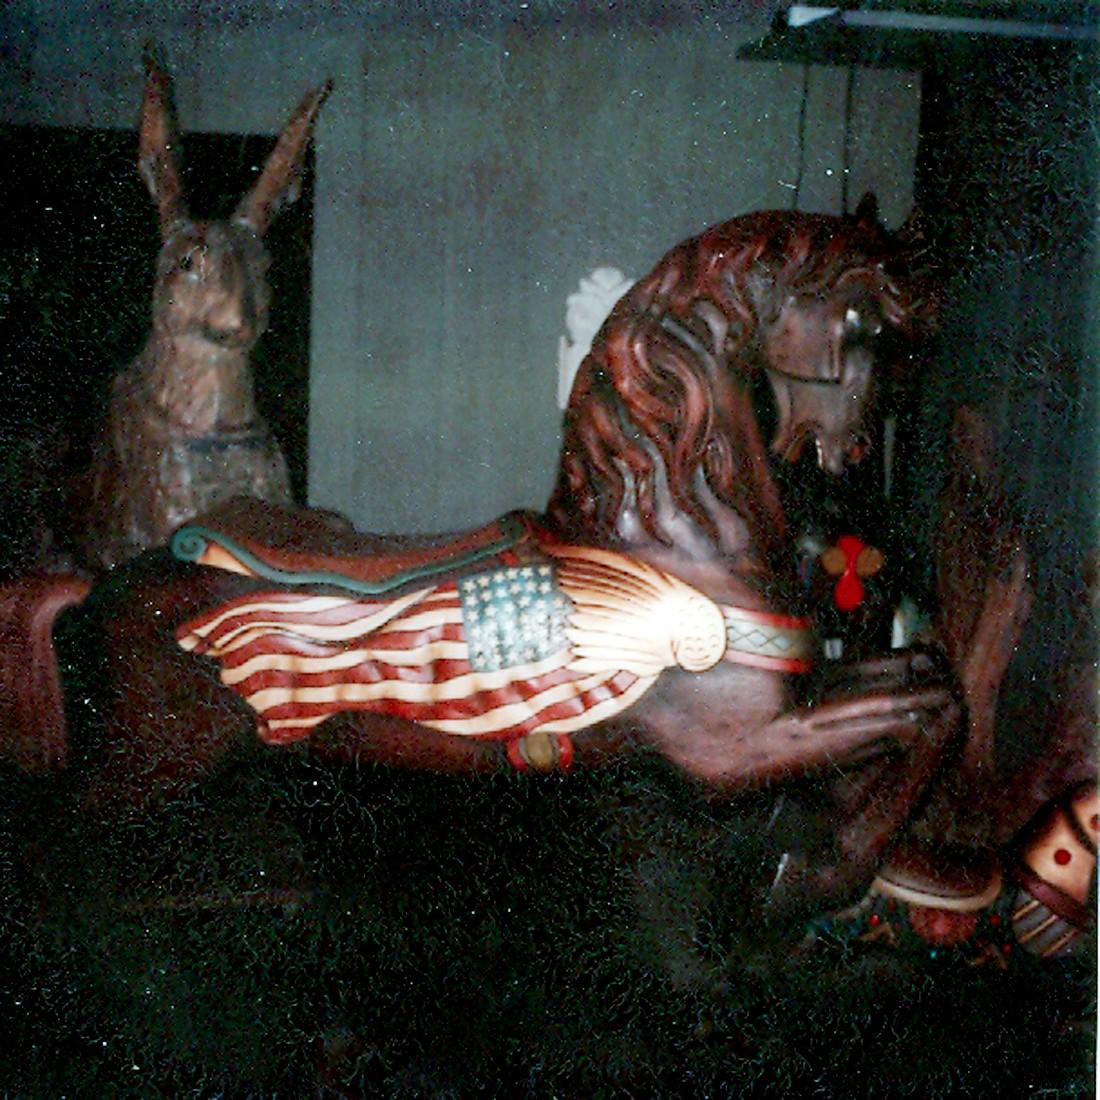 Redbug-Carousel-restoration-studio-1980-San-Francisco